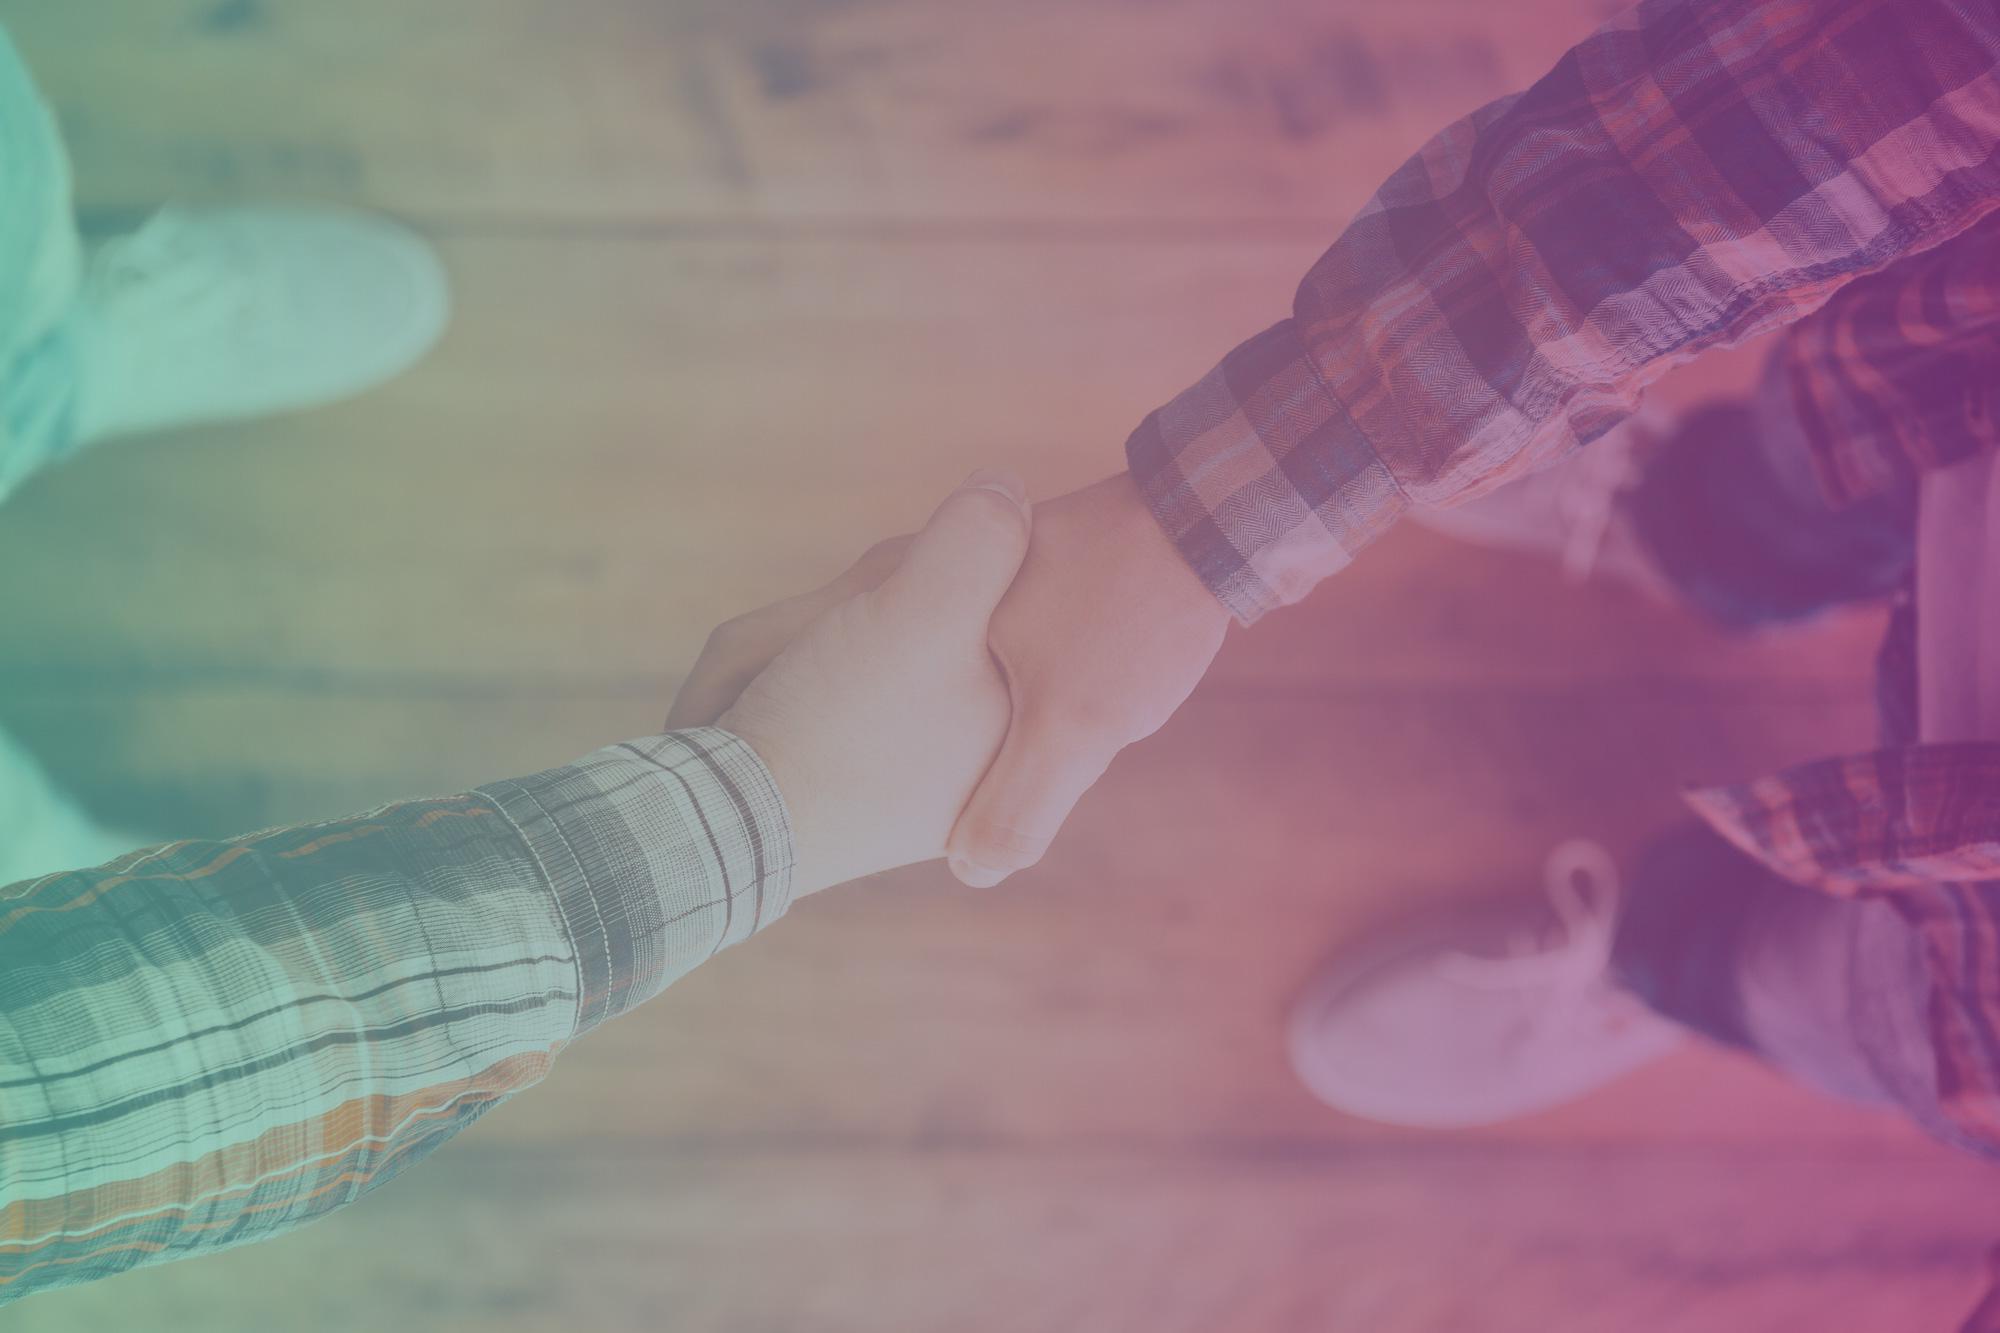 IZEA Becomes an Official Pinterest Marketing Partner